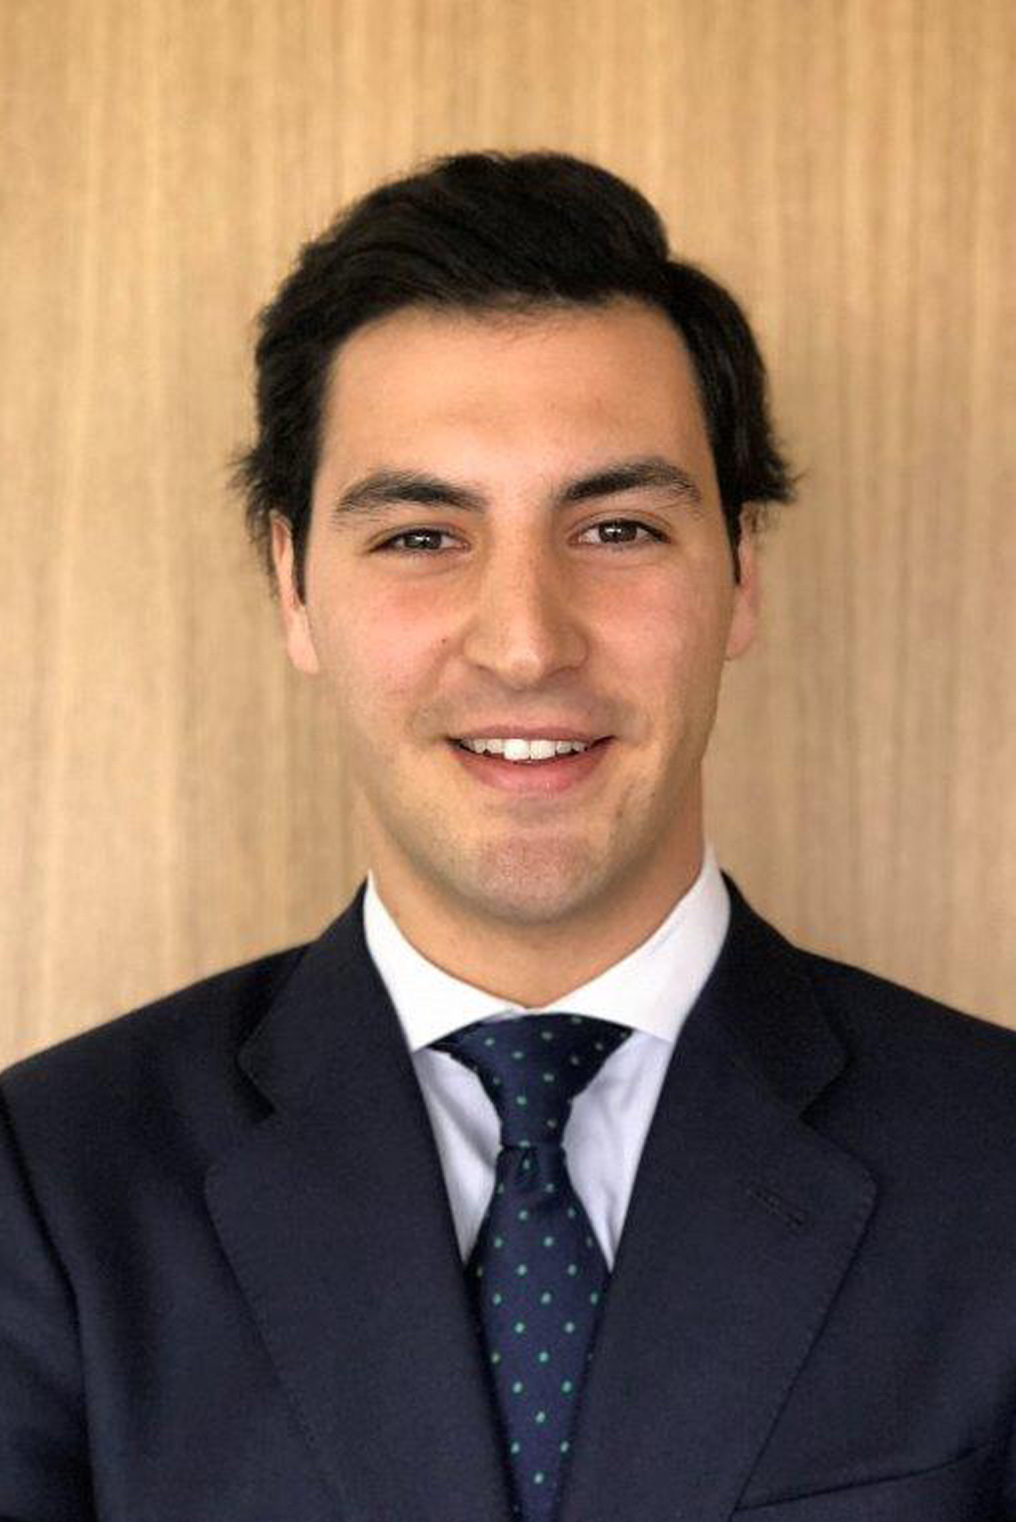 Jorge Vivancos